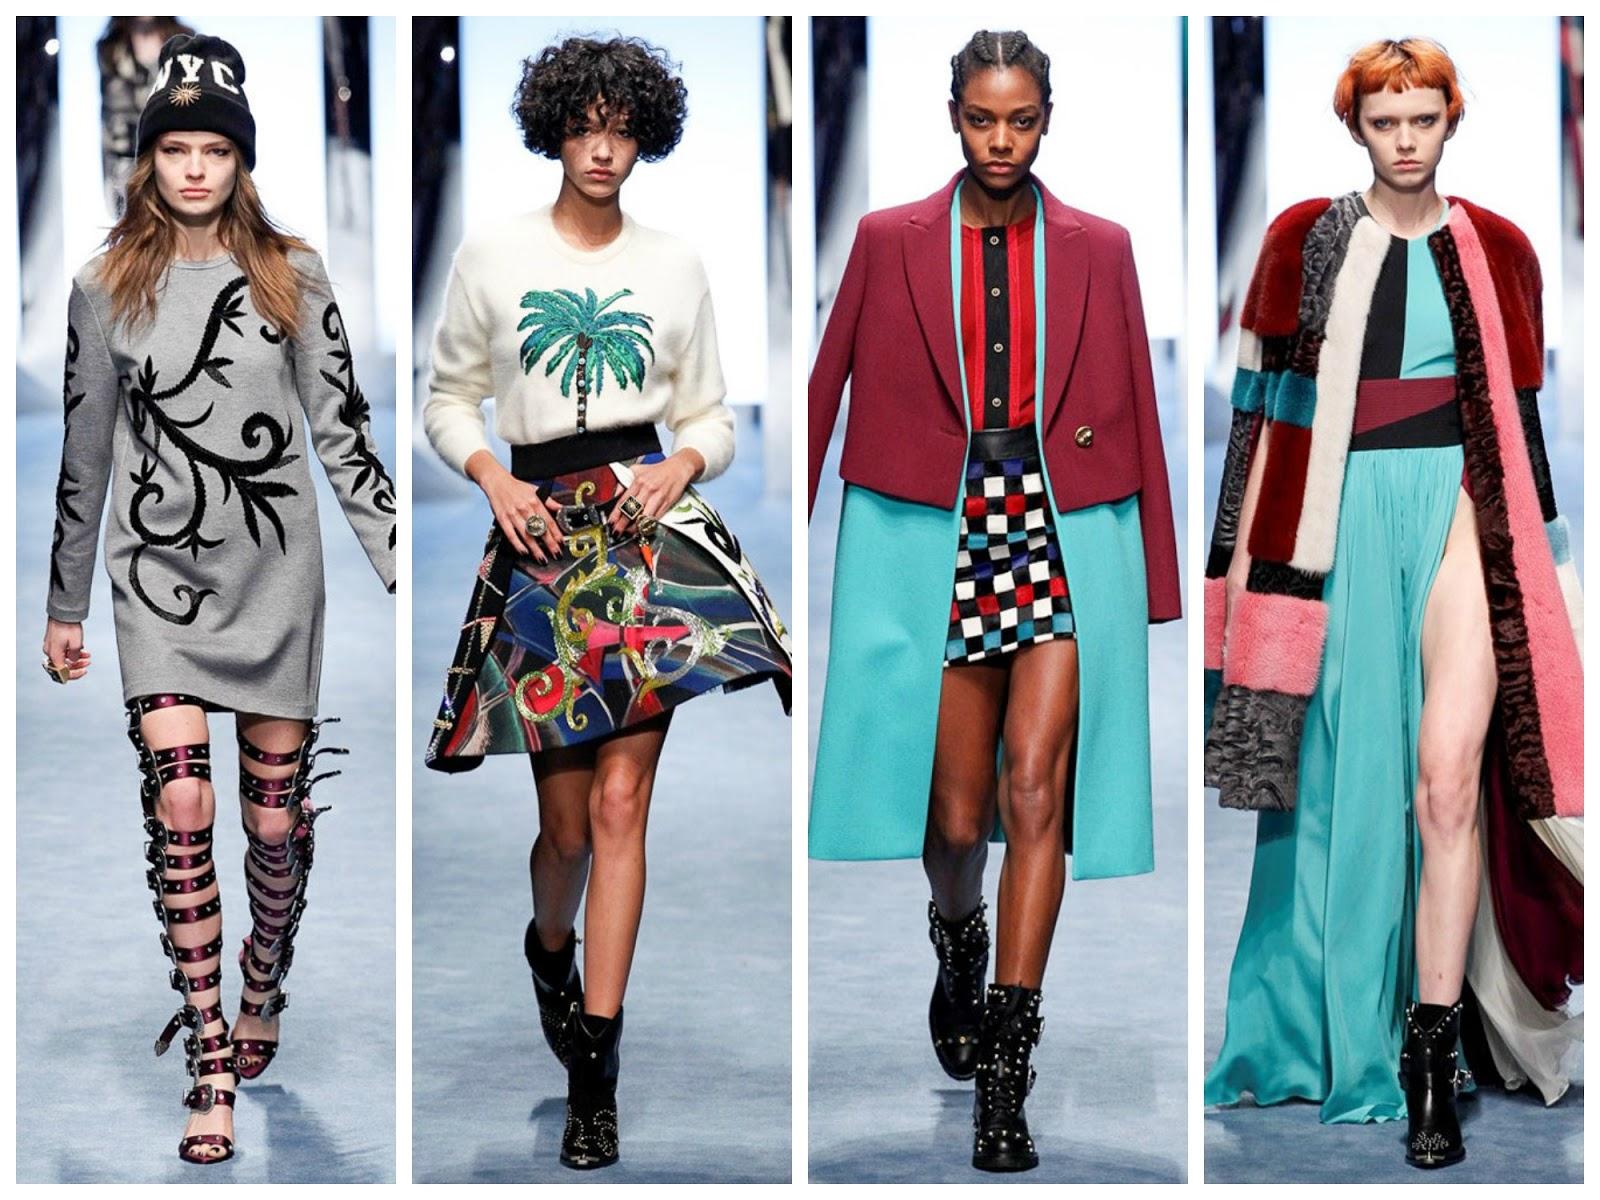 fausto-puglisi-fall-winter-2016-fashion-show-milan